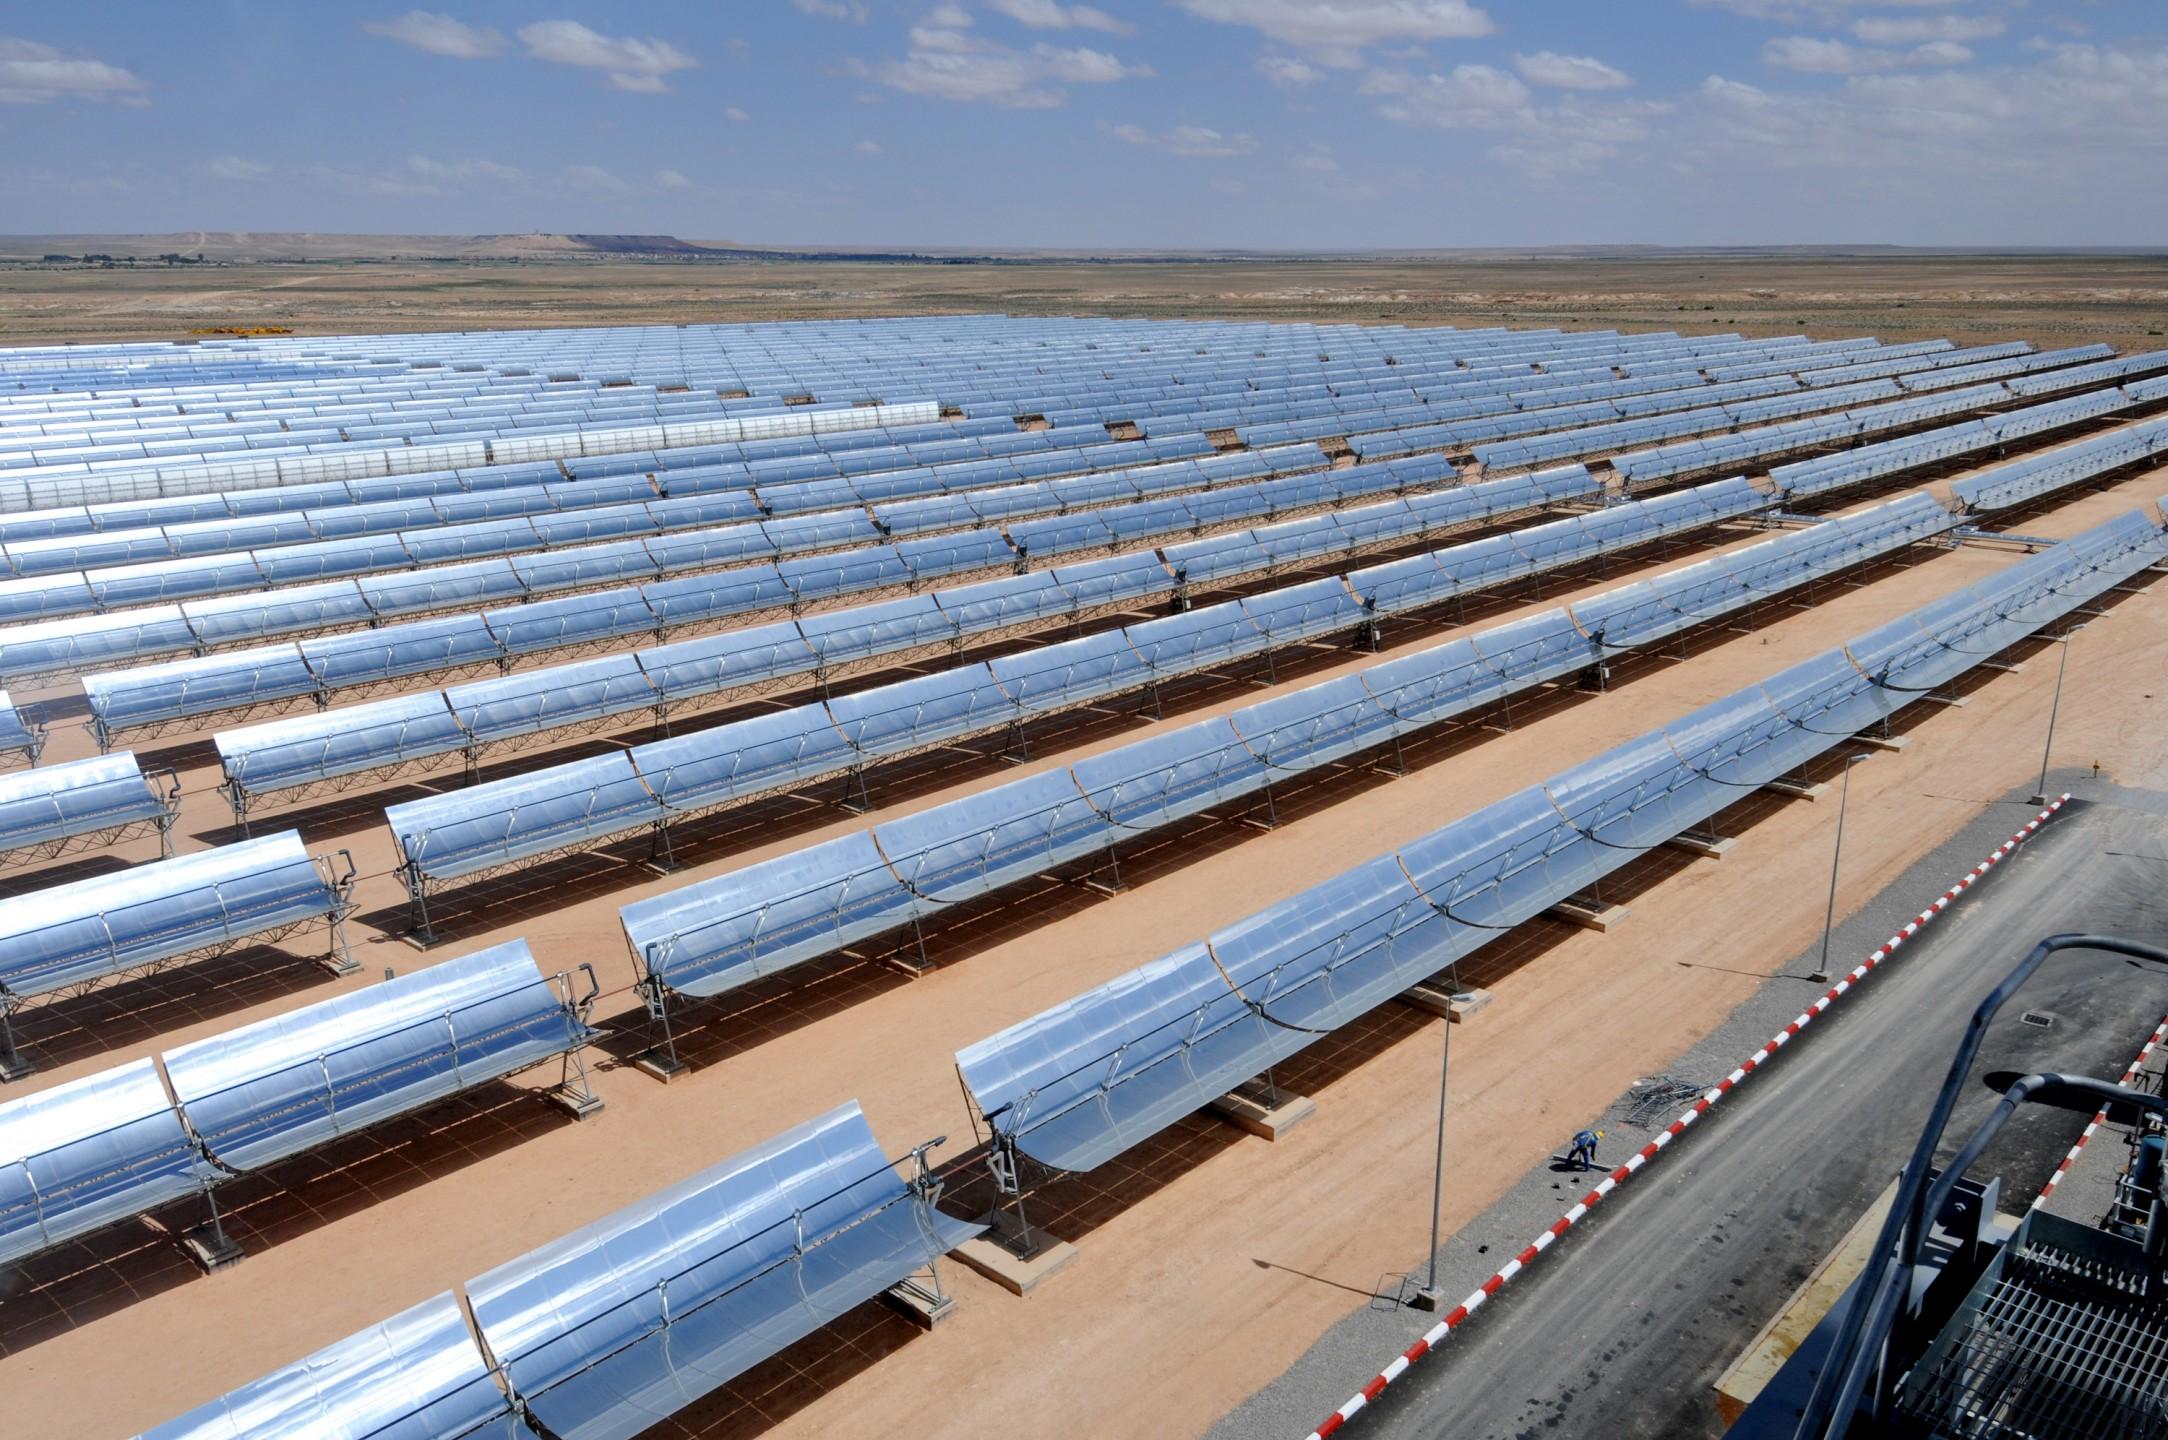 Zonne-energieproductie Ain Bni Mathar, World Bank Photo Collection